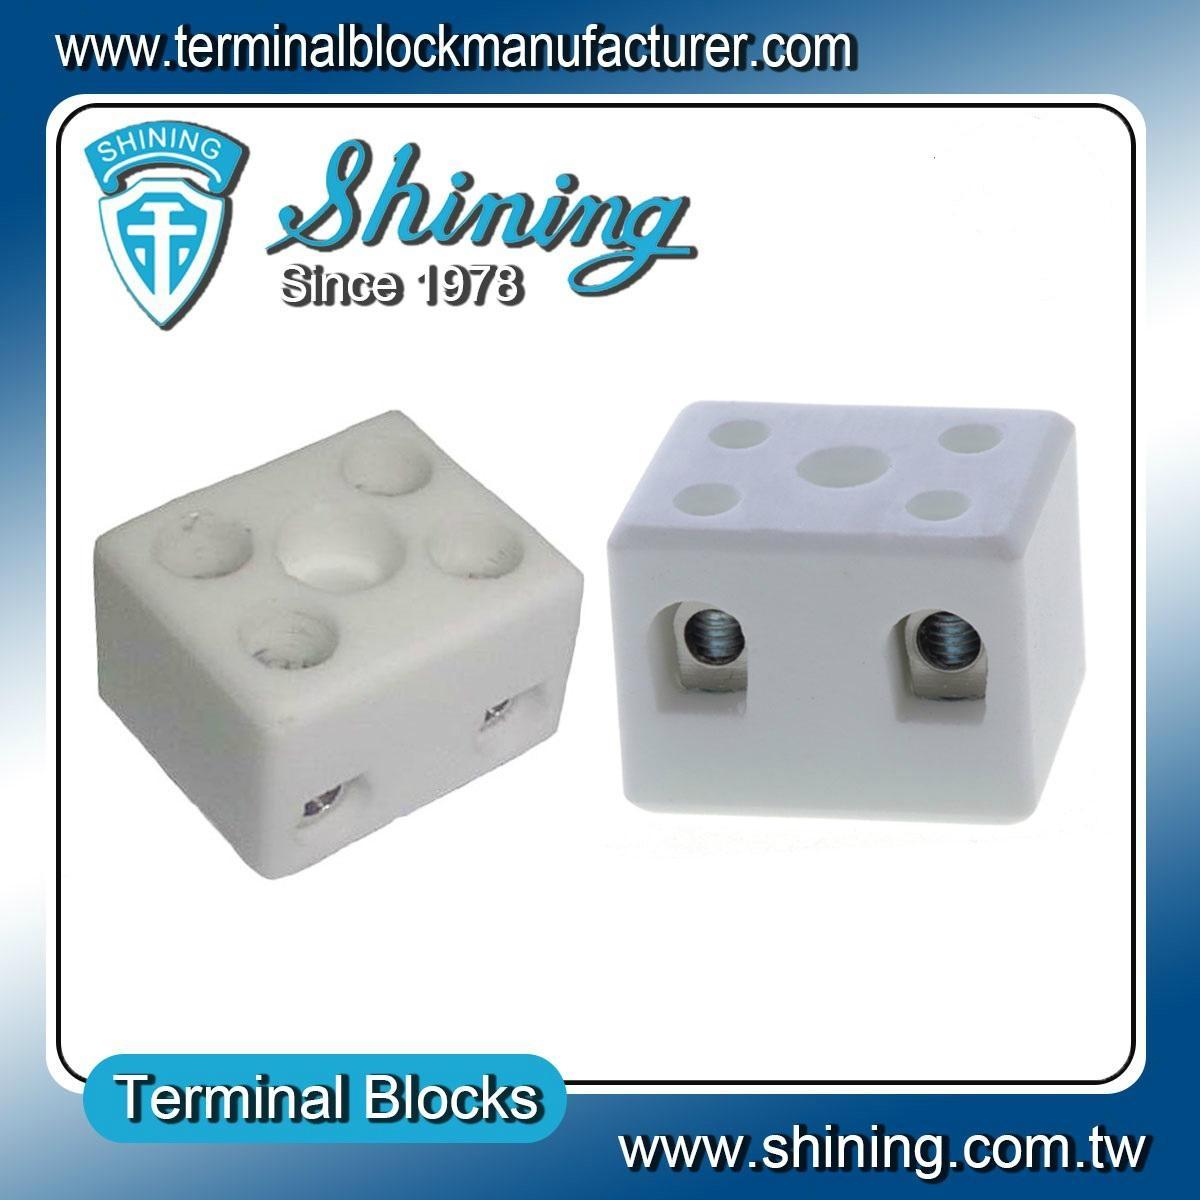 TC-202-A 陶瓷端子台 Ceramic Terminal Block 3